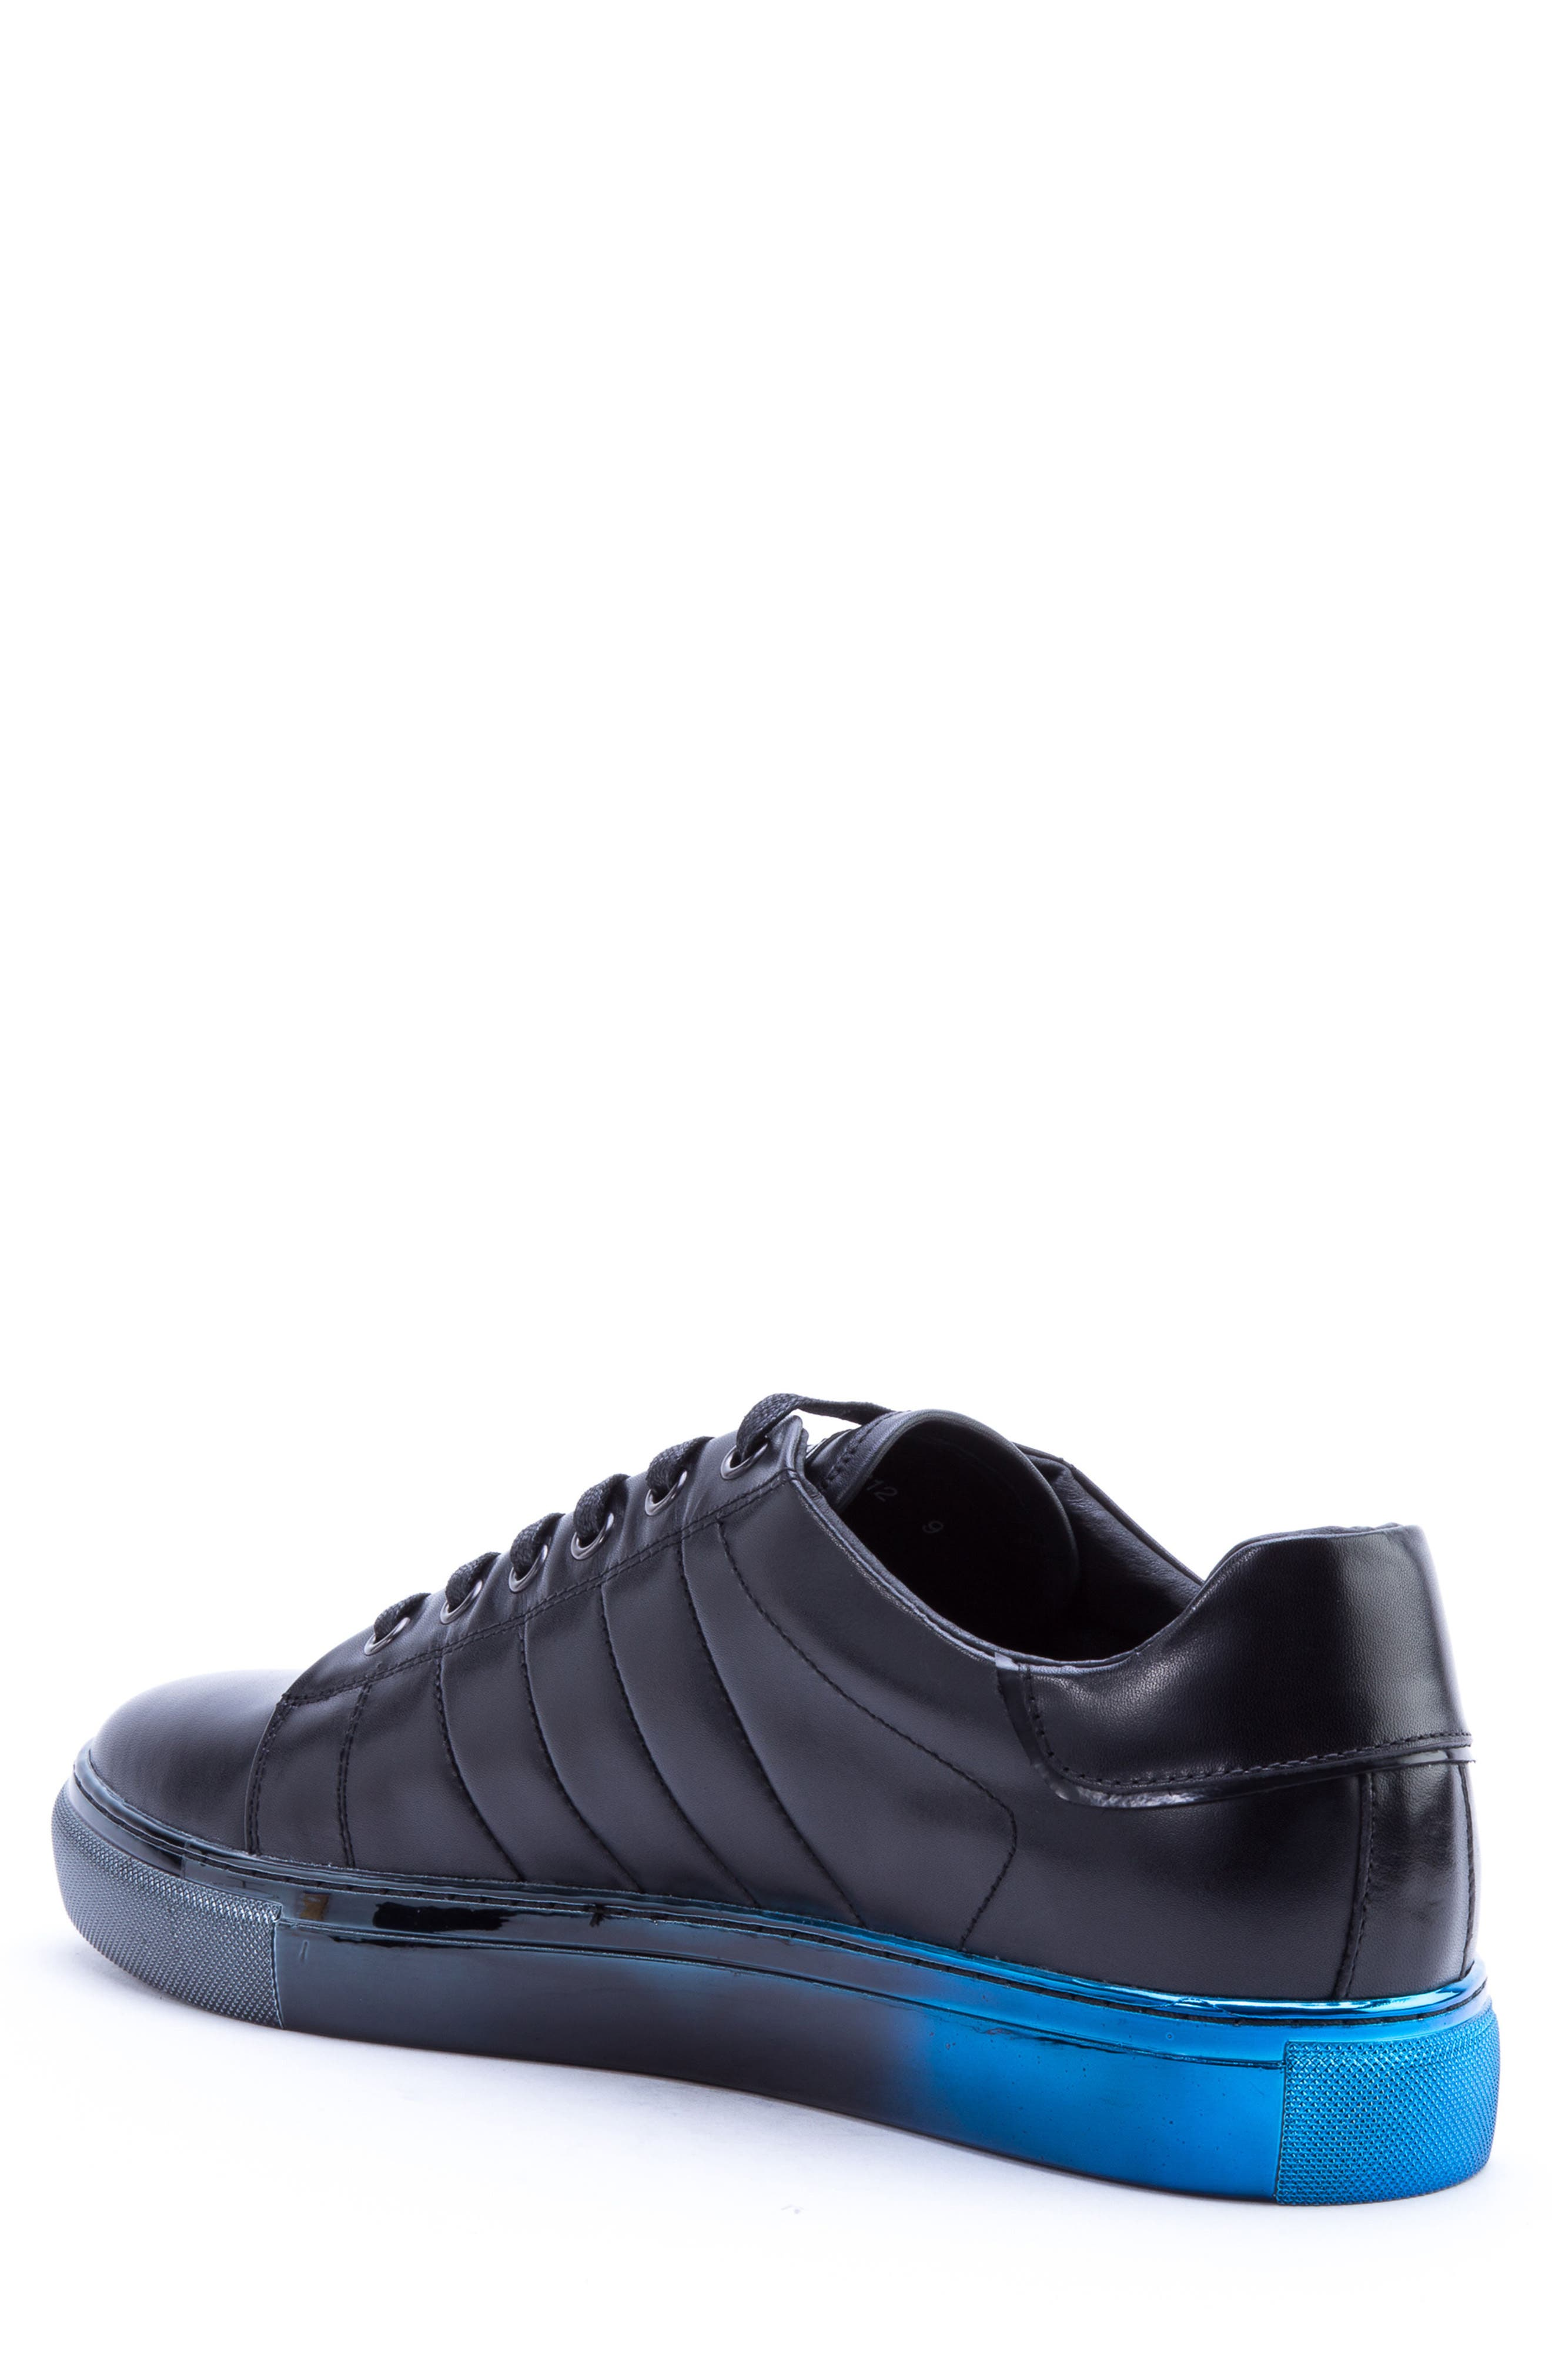 Brando Sneaker,                             Alternate thumbnail 2, color,                             BLACK LEATHER